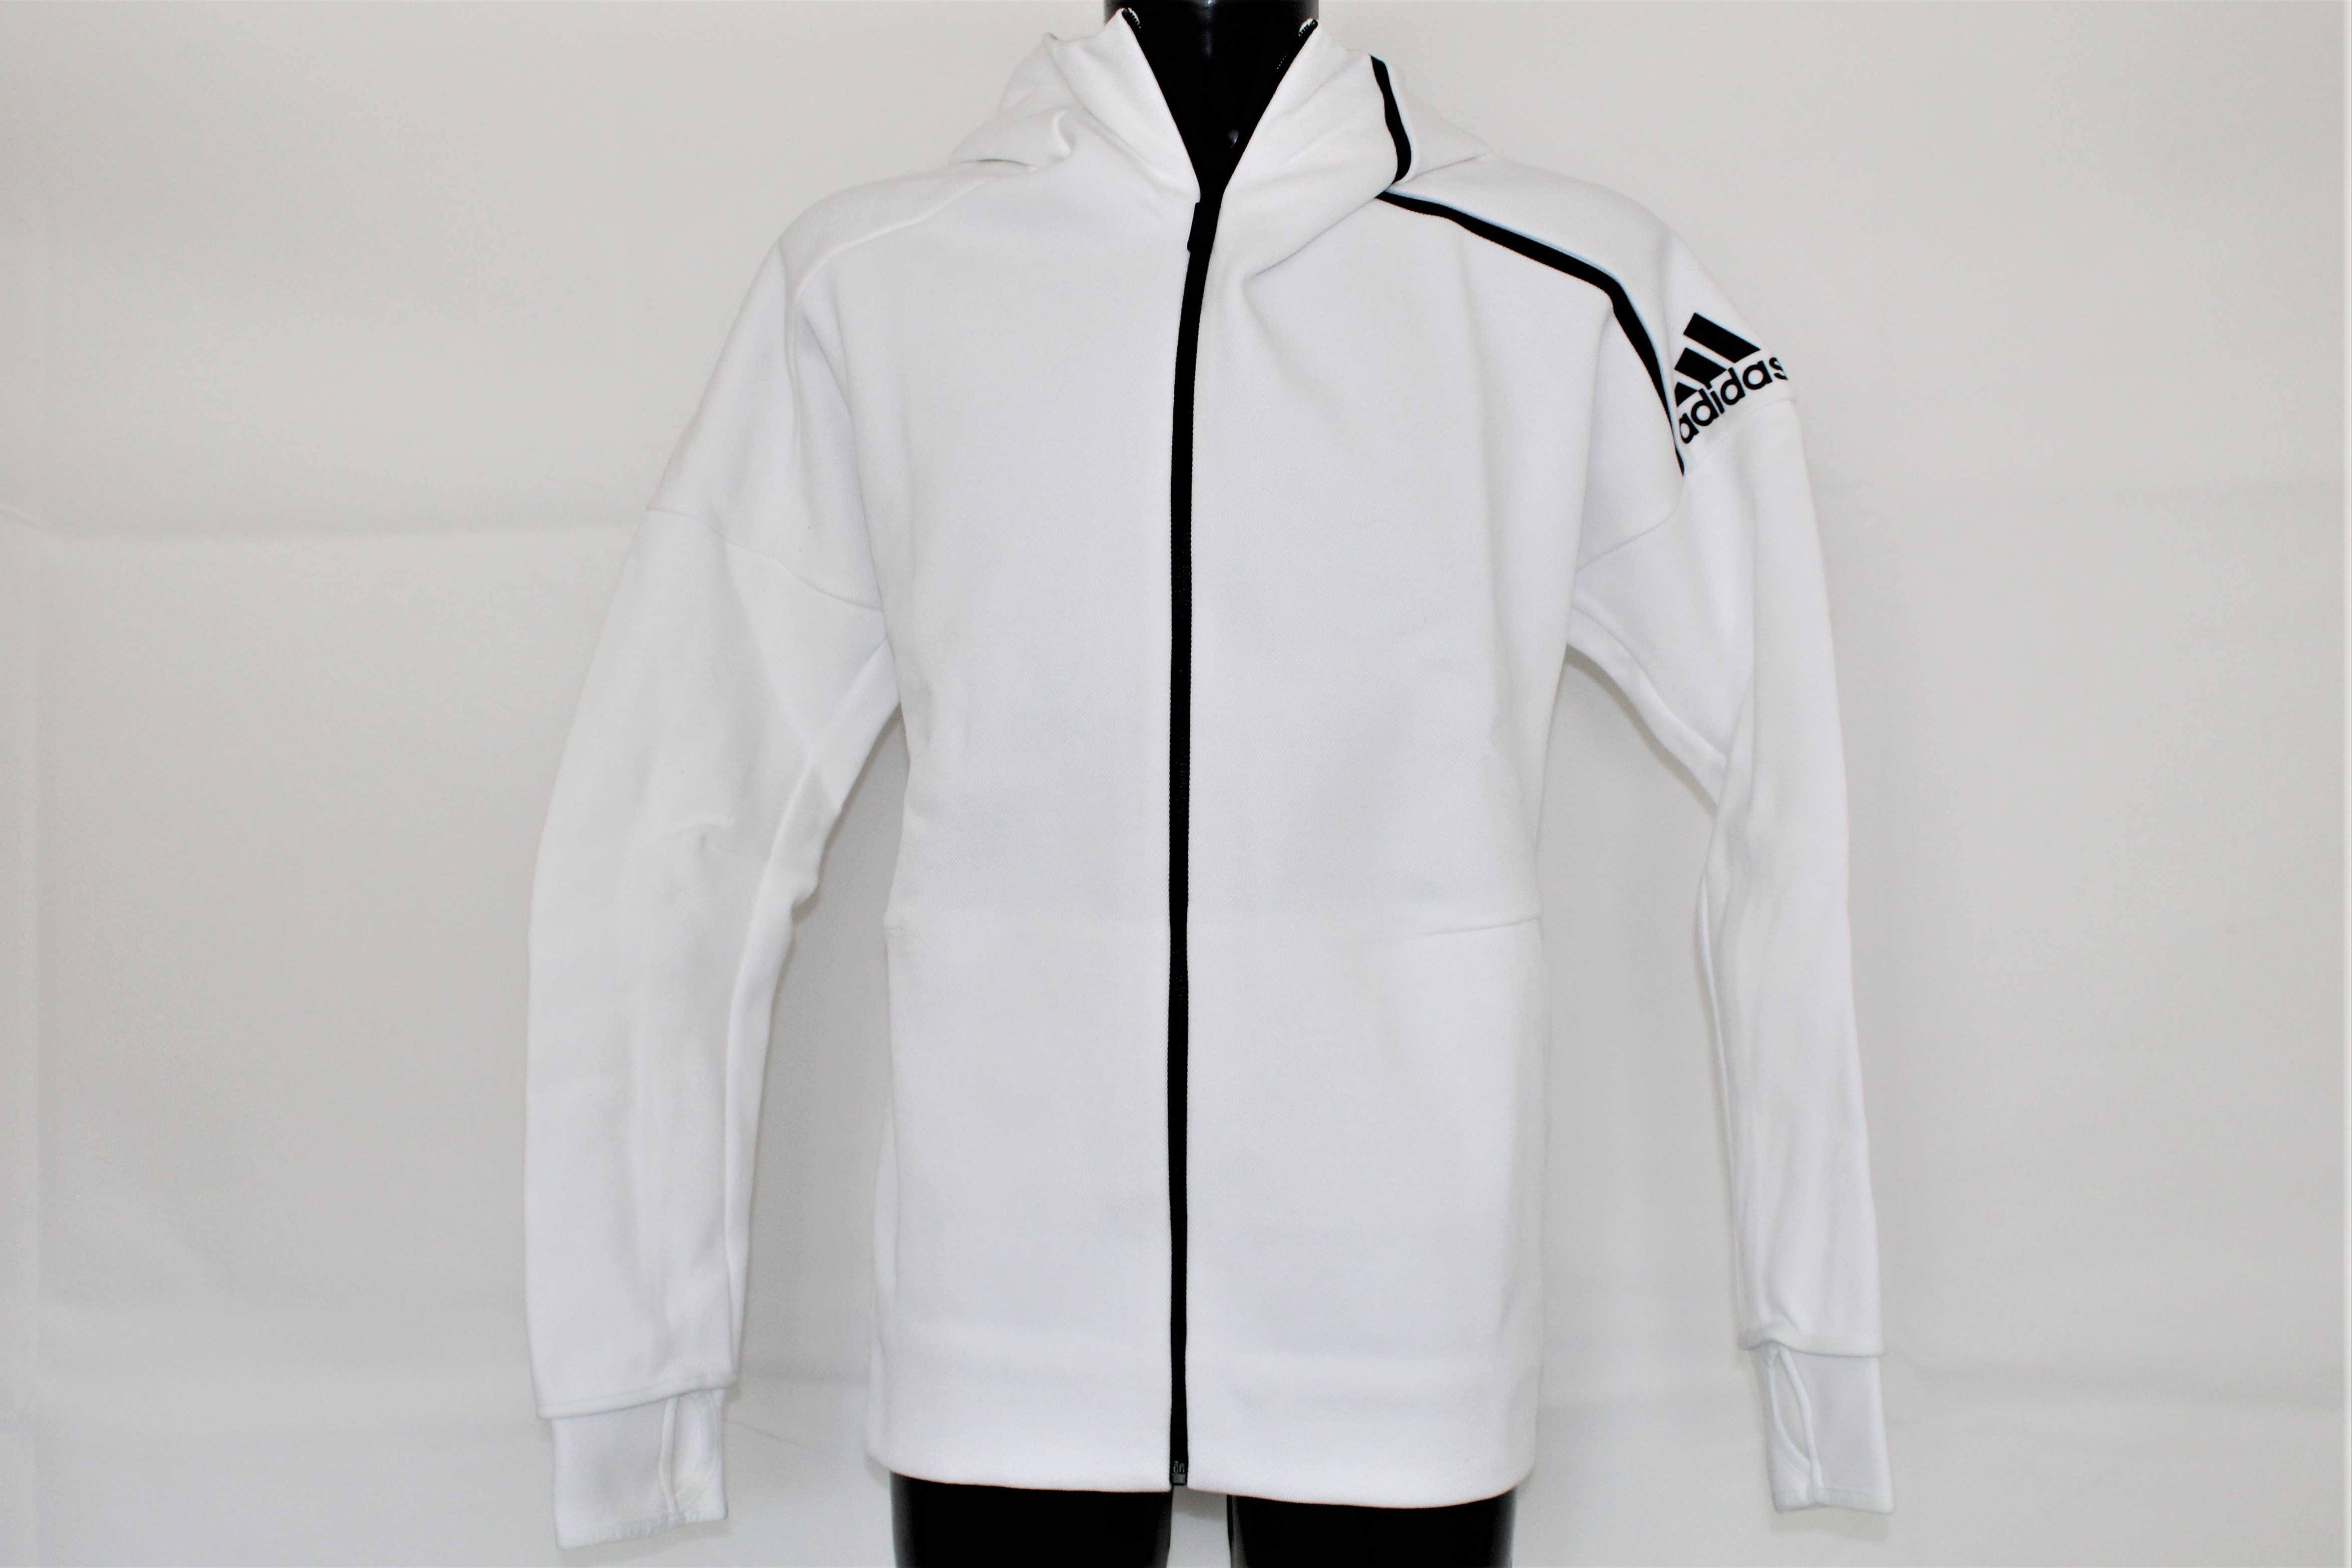 Adidas Herren Z.N.E. Hoody Zip Jacke weiss schwarz